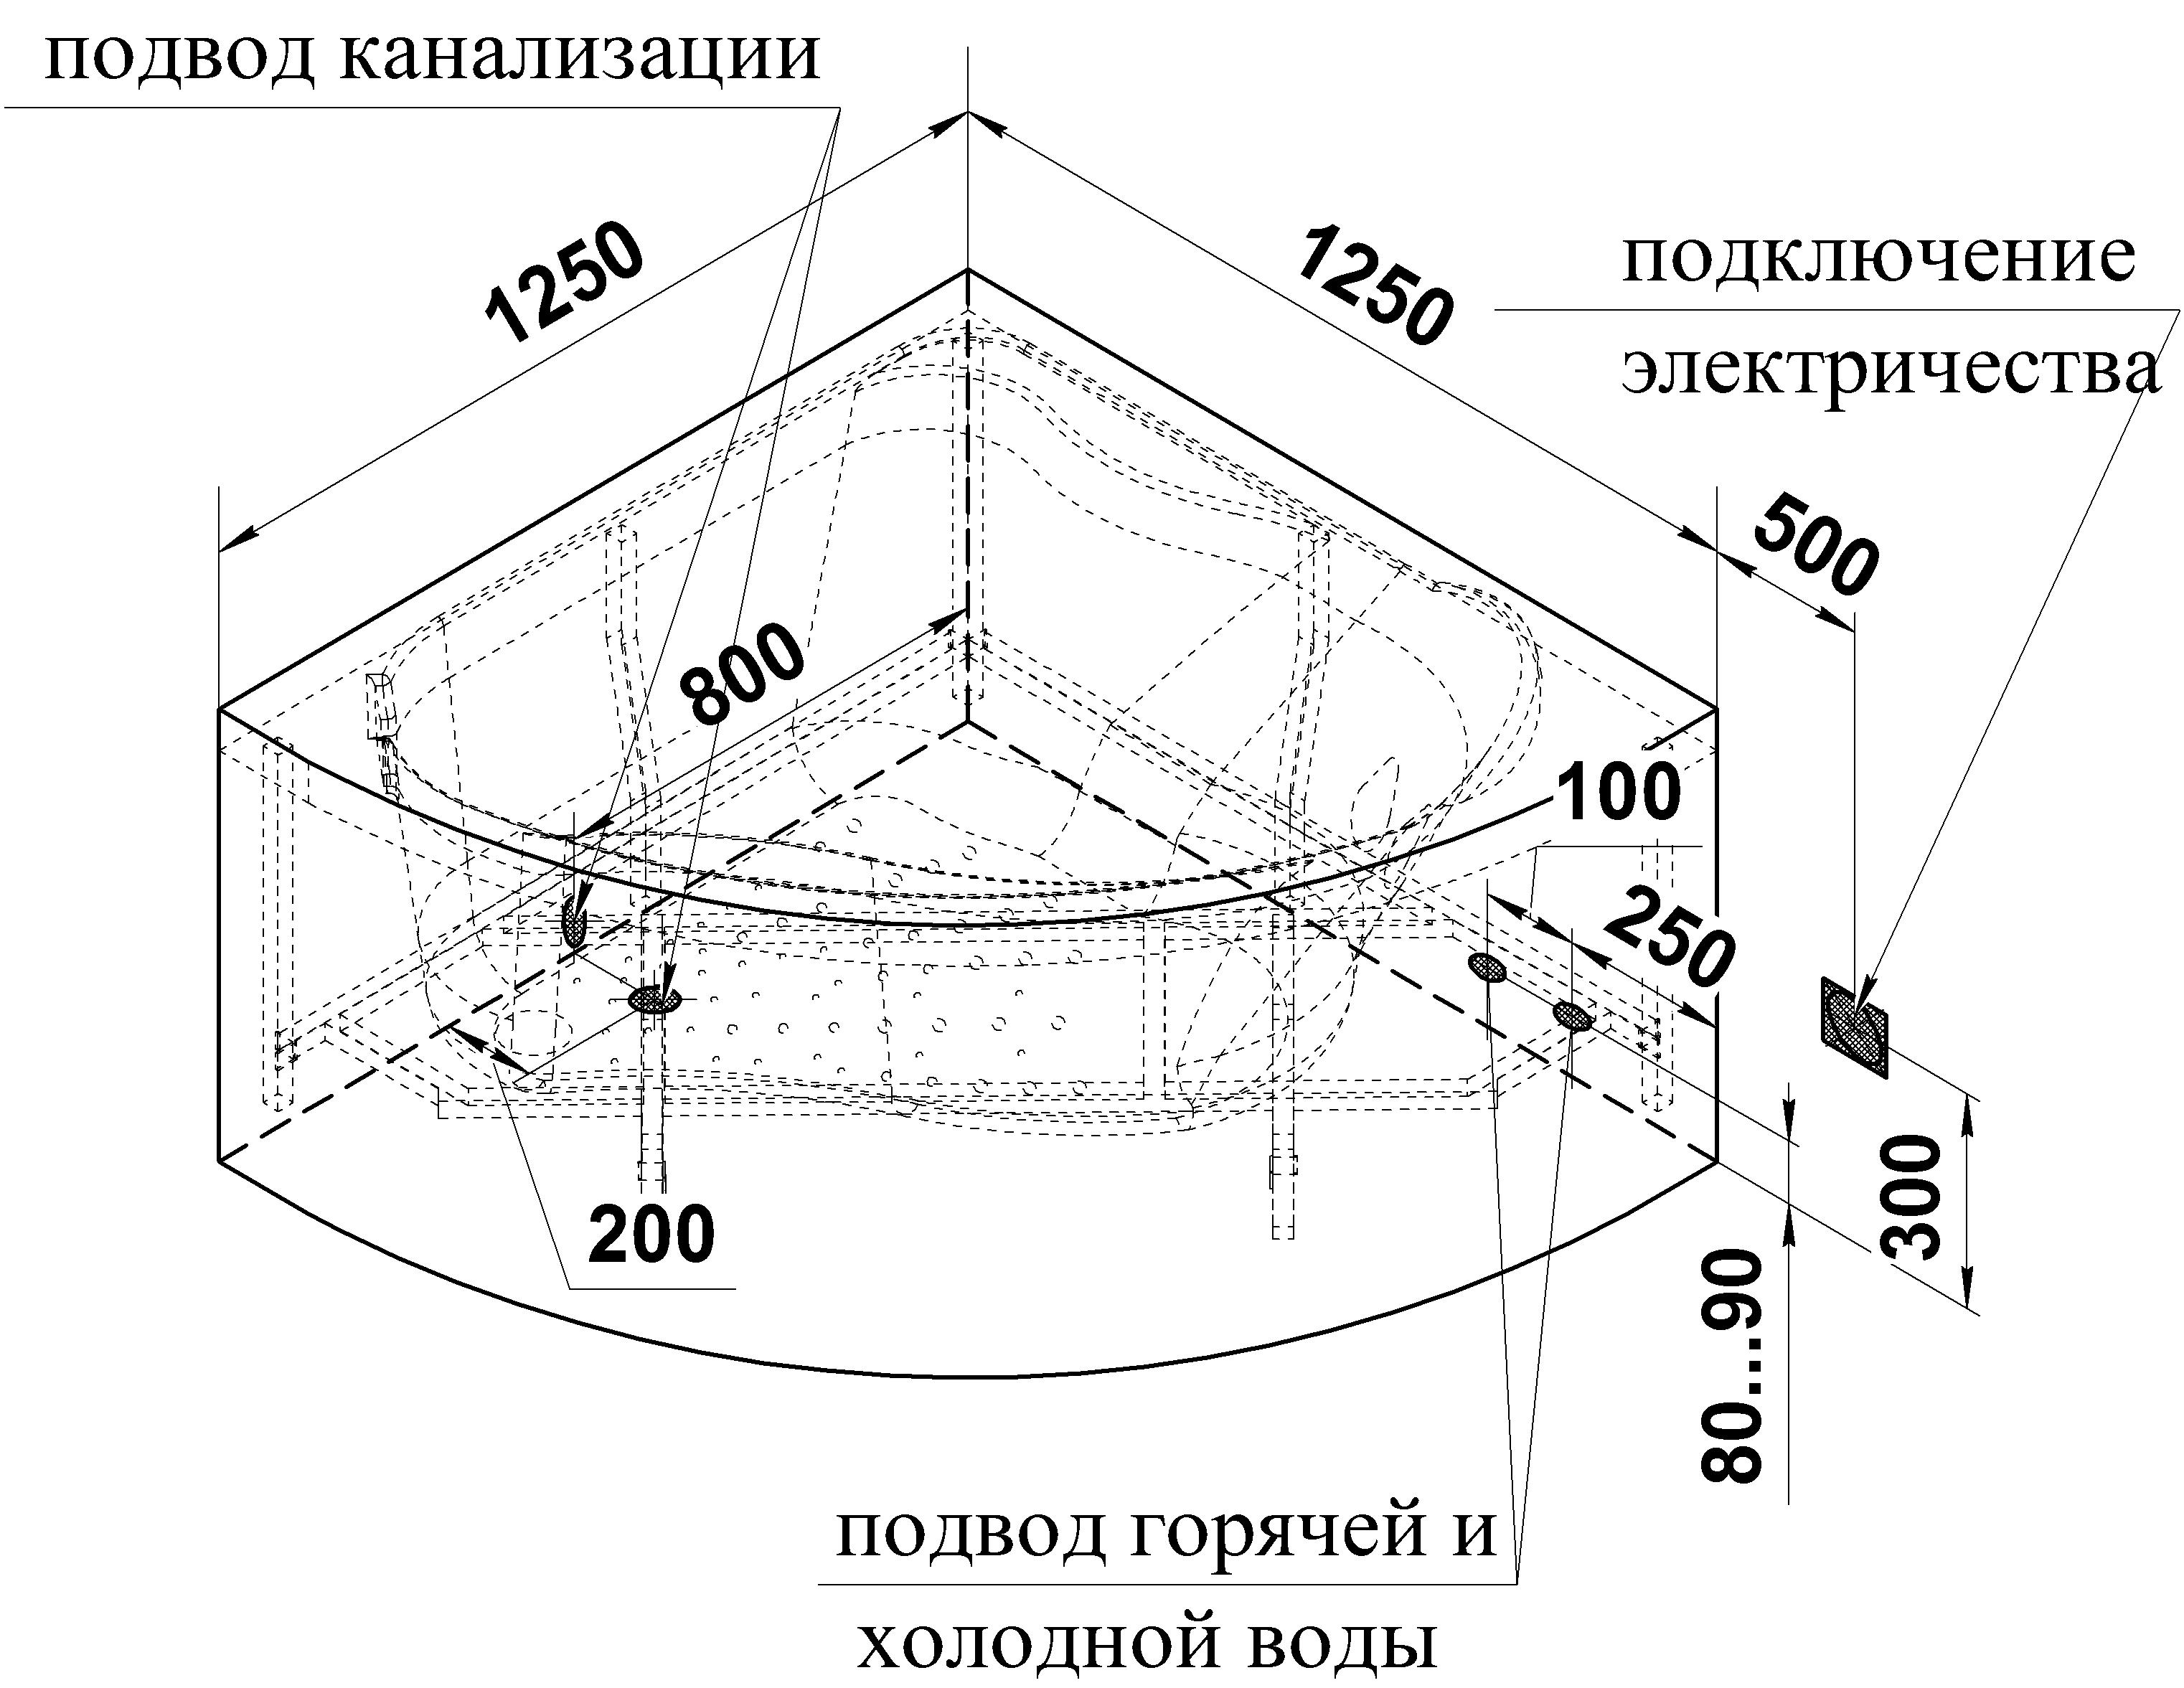 Фото 1012: Акриловая ванна Радомир (Vannesa) Альтея 125 х 125